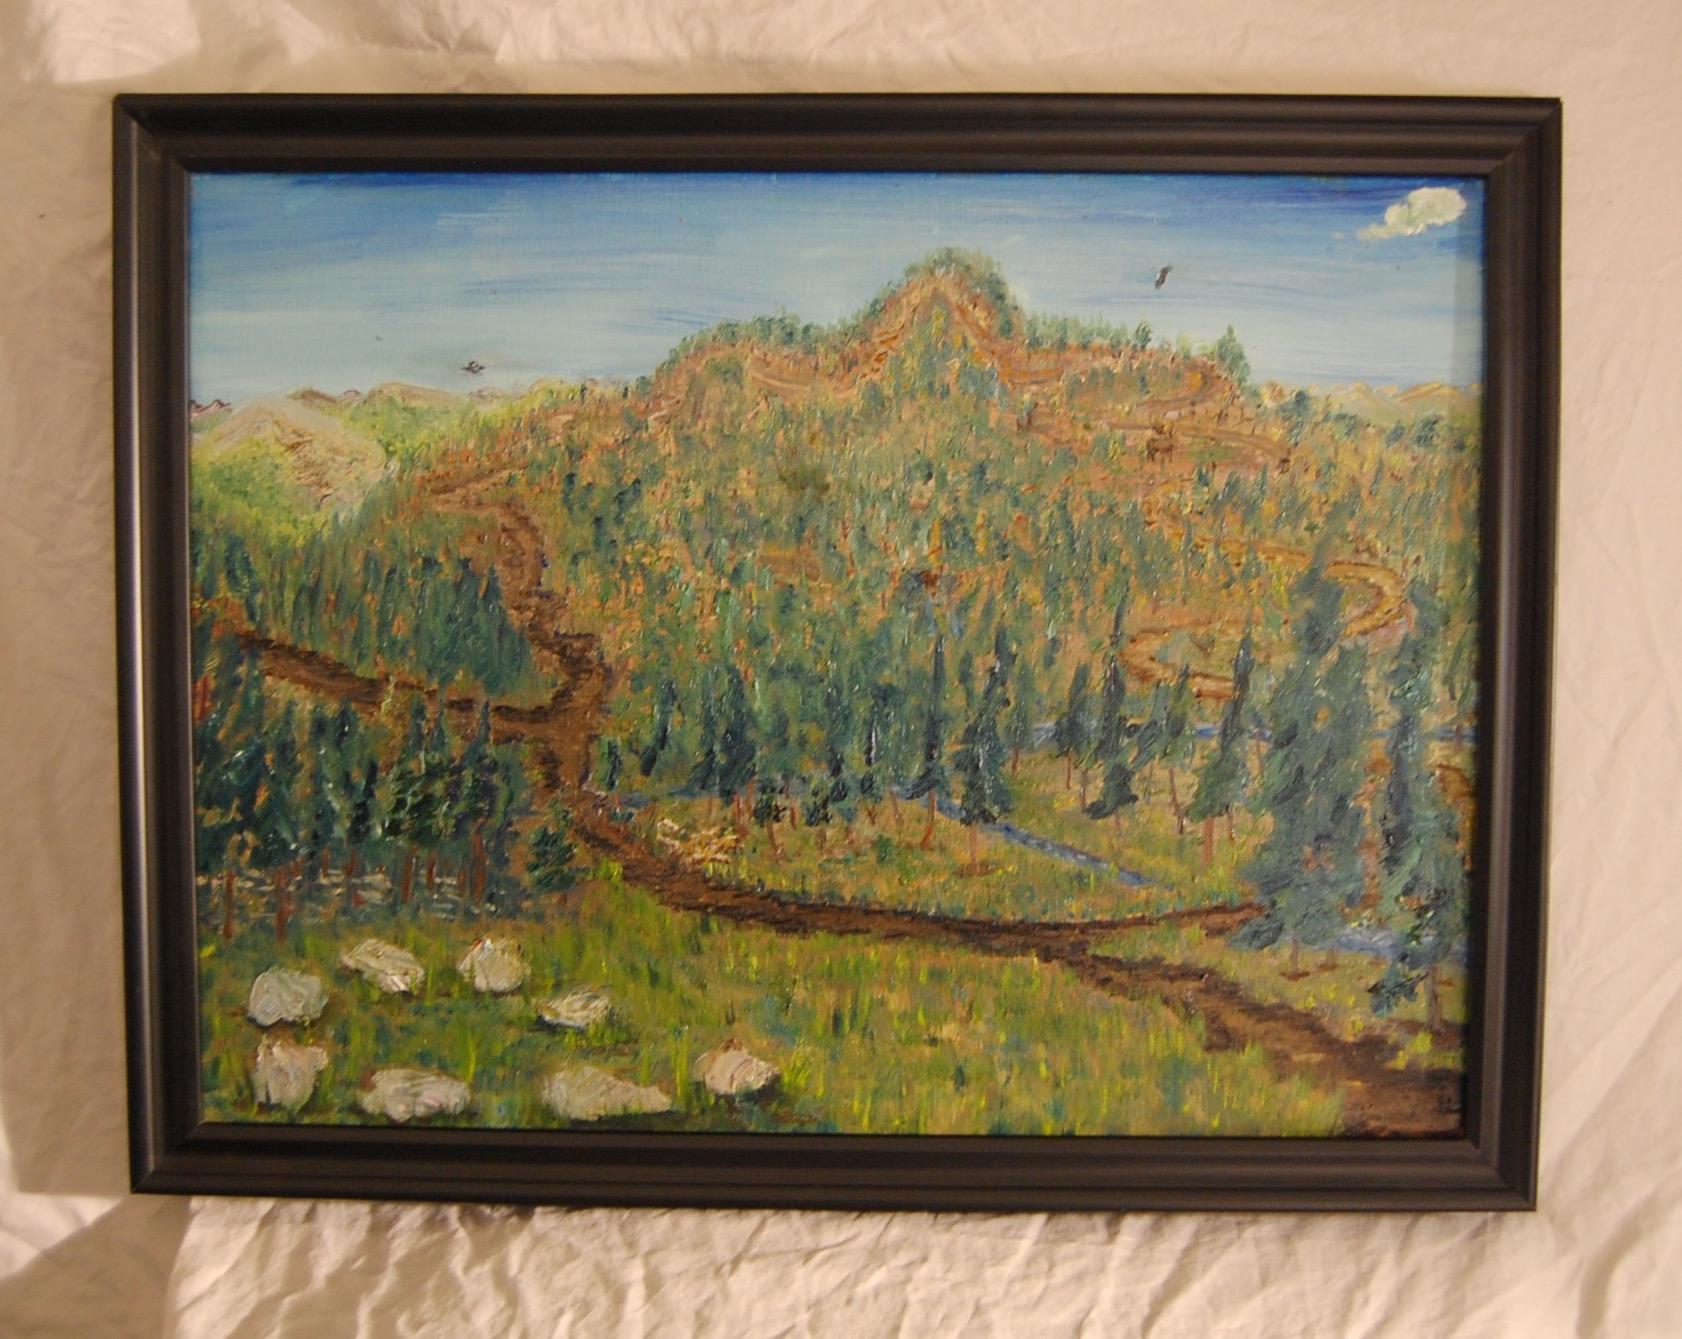 East Mountain  Oil on canvas  18 x 24  Black frame